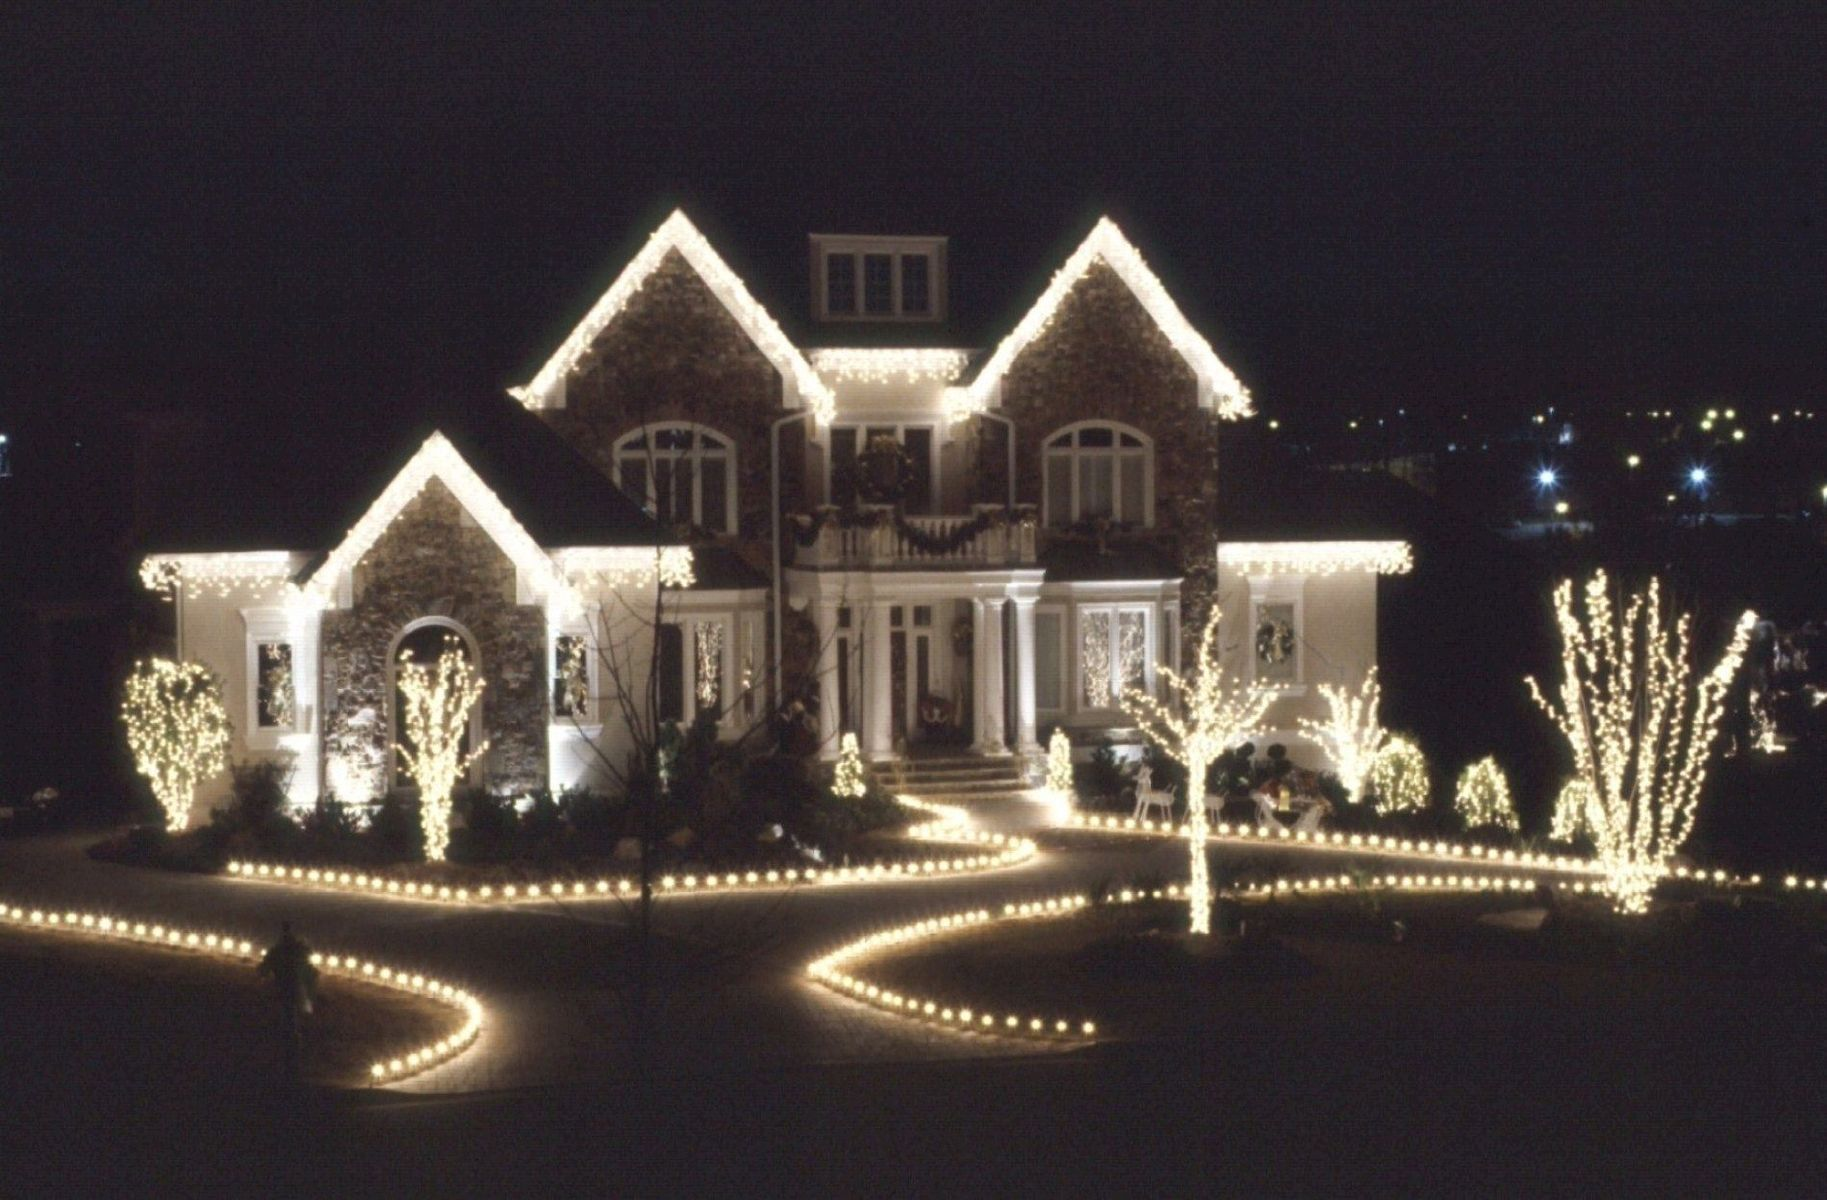 Outdoor Christmas Lights Decorations Ideas 26 Christmas Lights